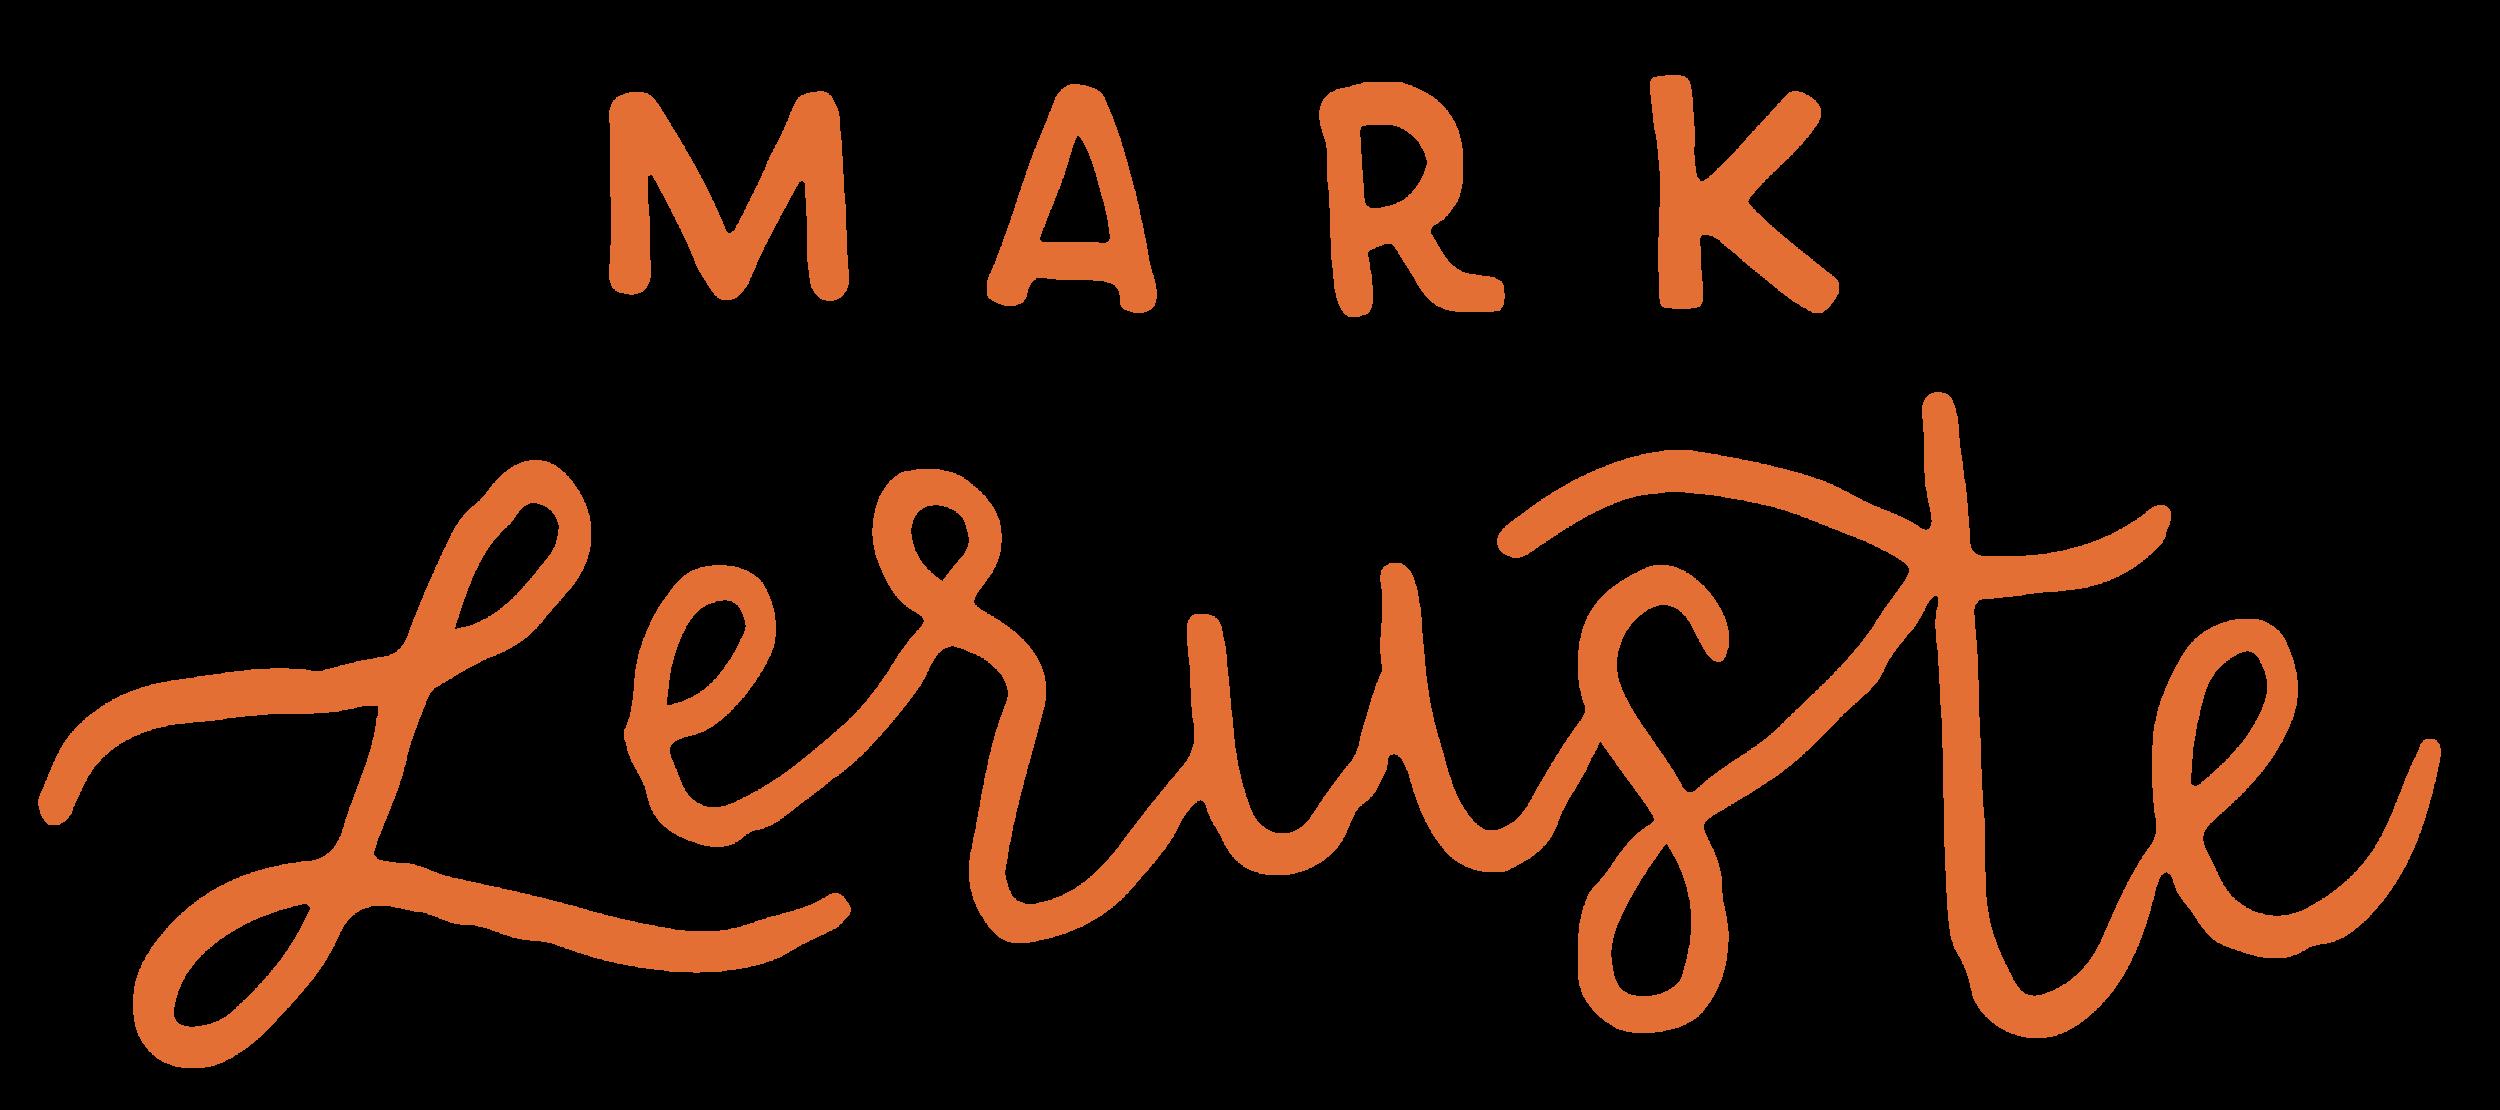 MarkLeruste.png